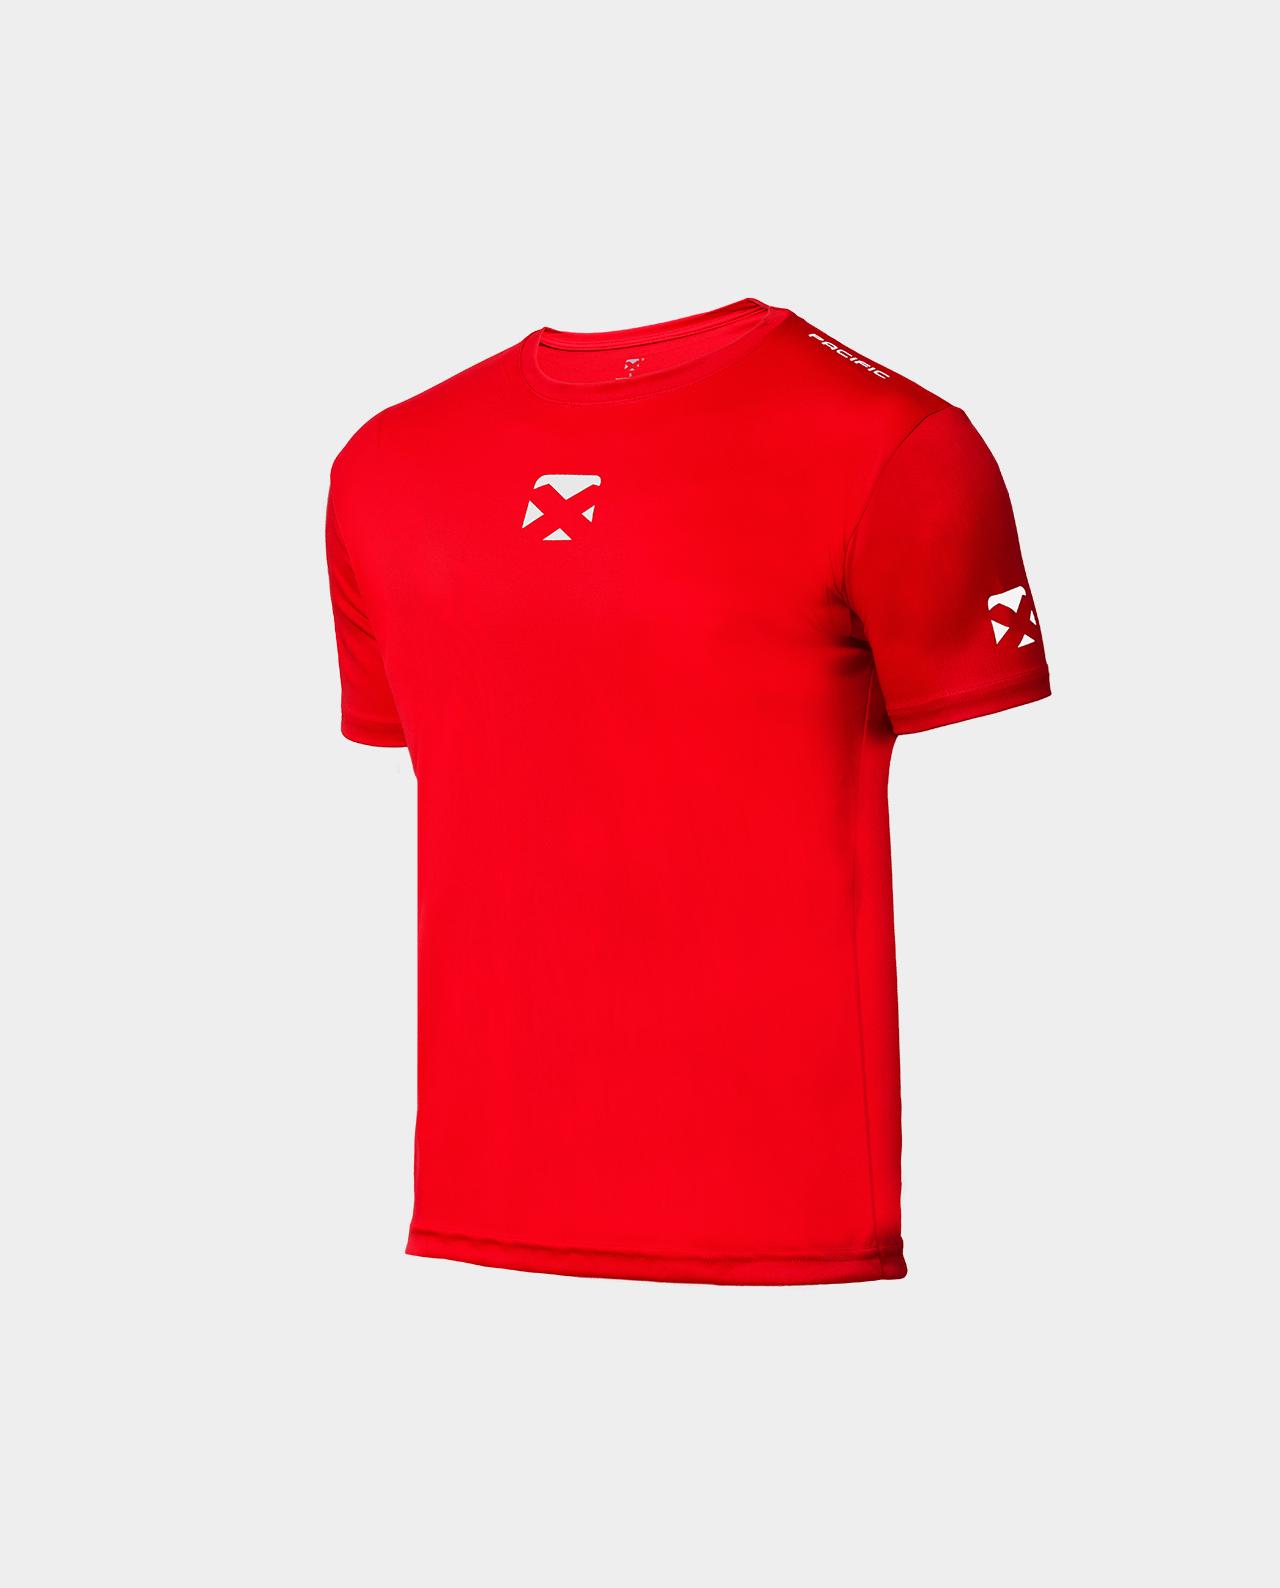 Futura Tee-red (WH) 1